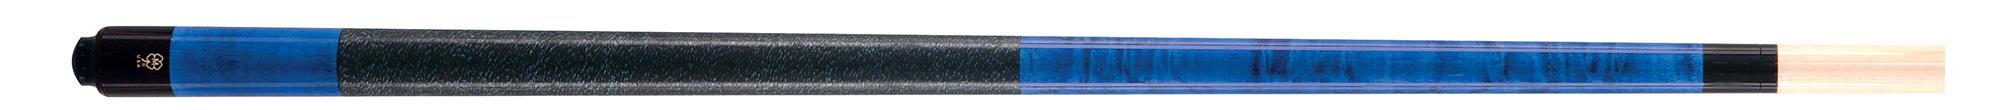 PK3057: McDermott GS02 Pacific Blue pool #1